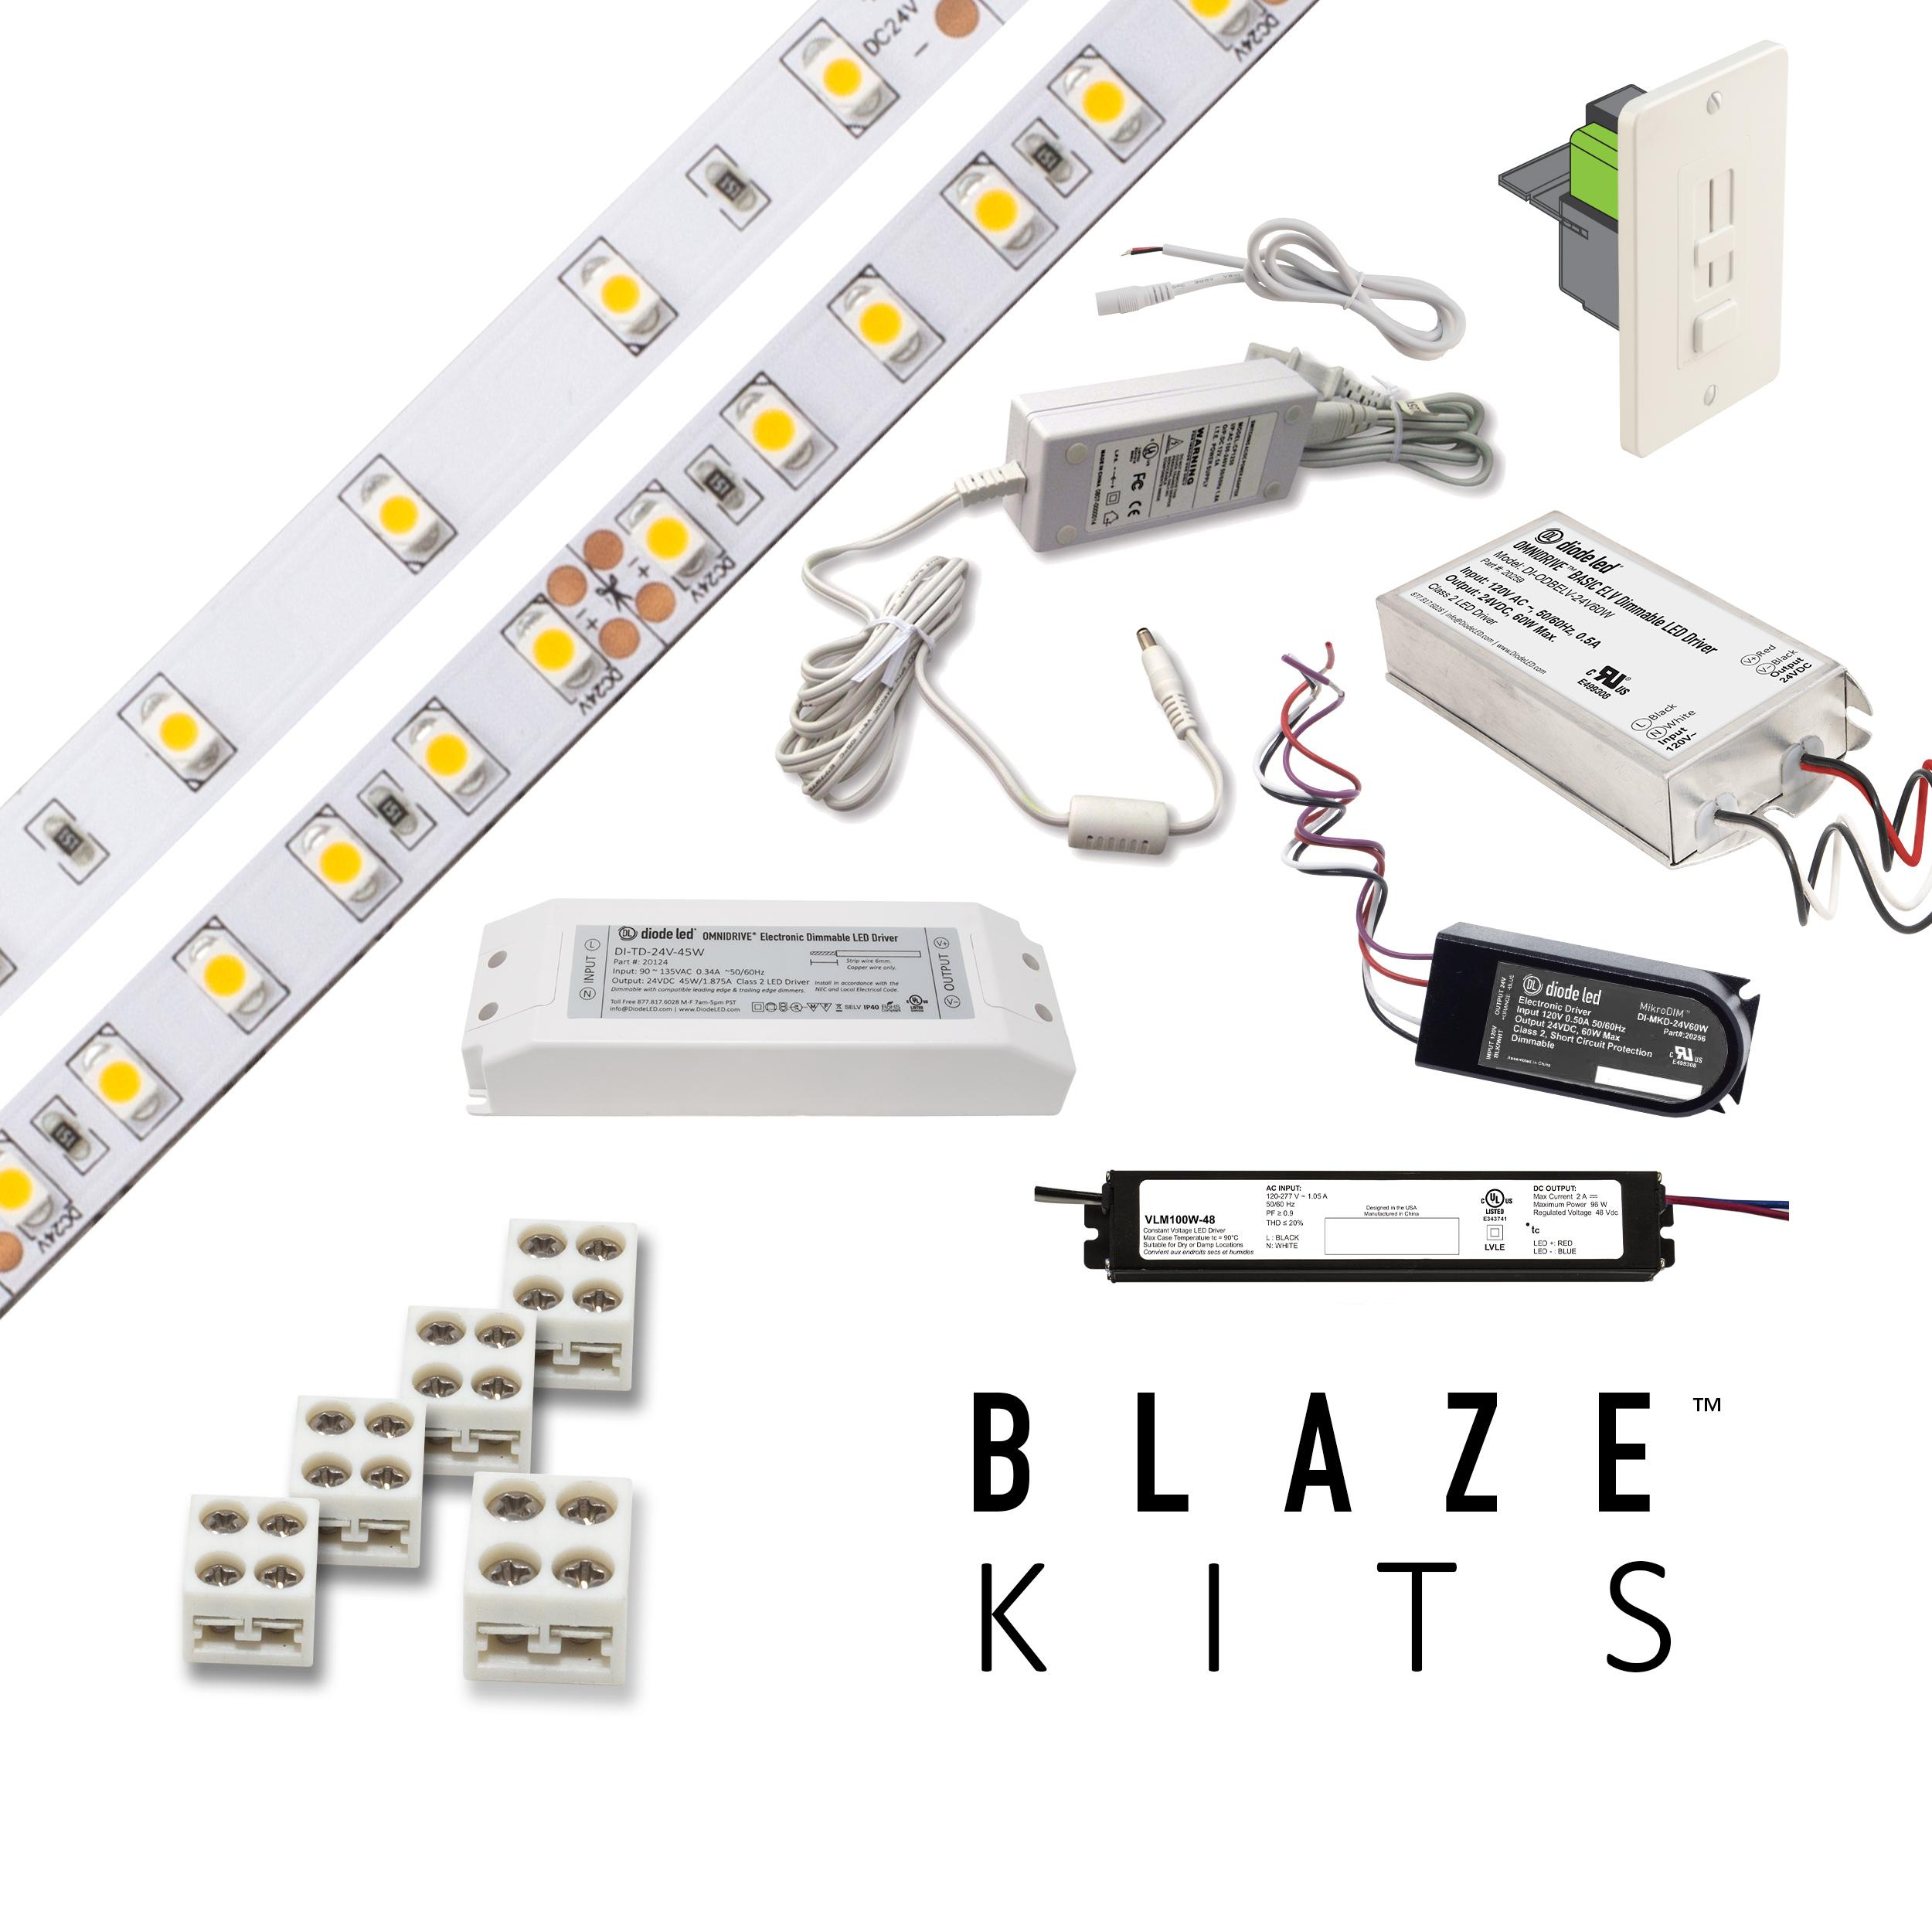 BLAZE™ Kits